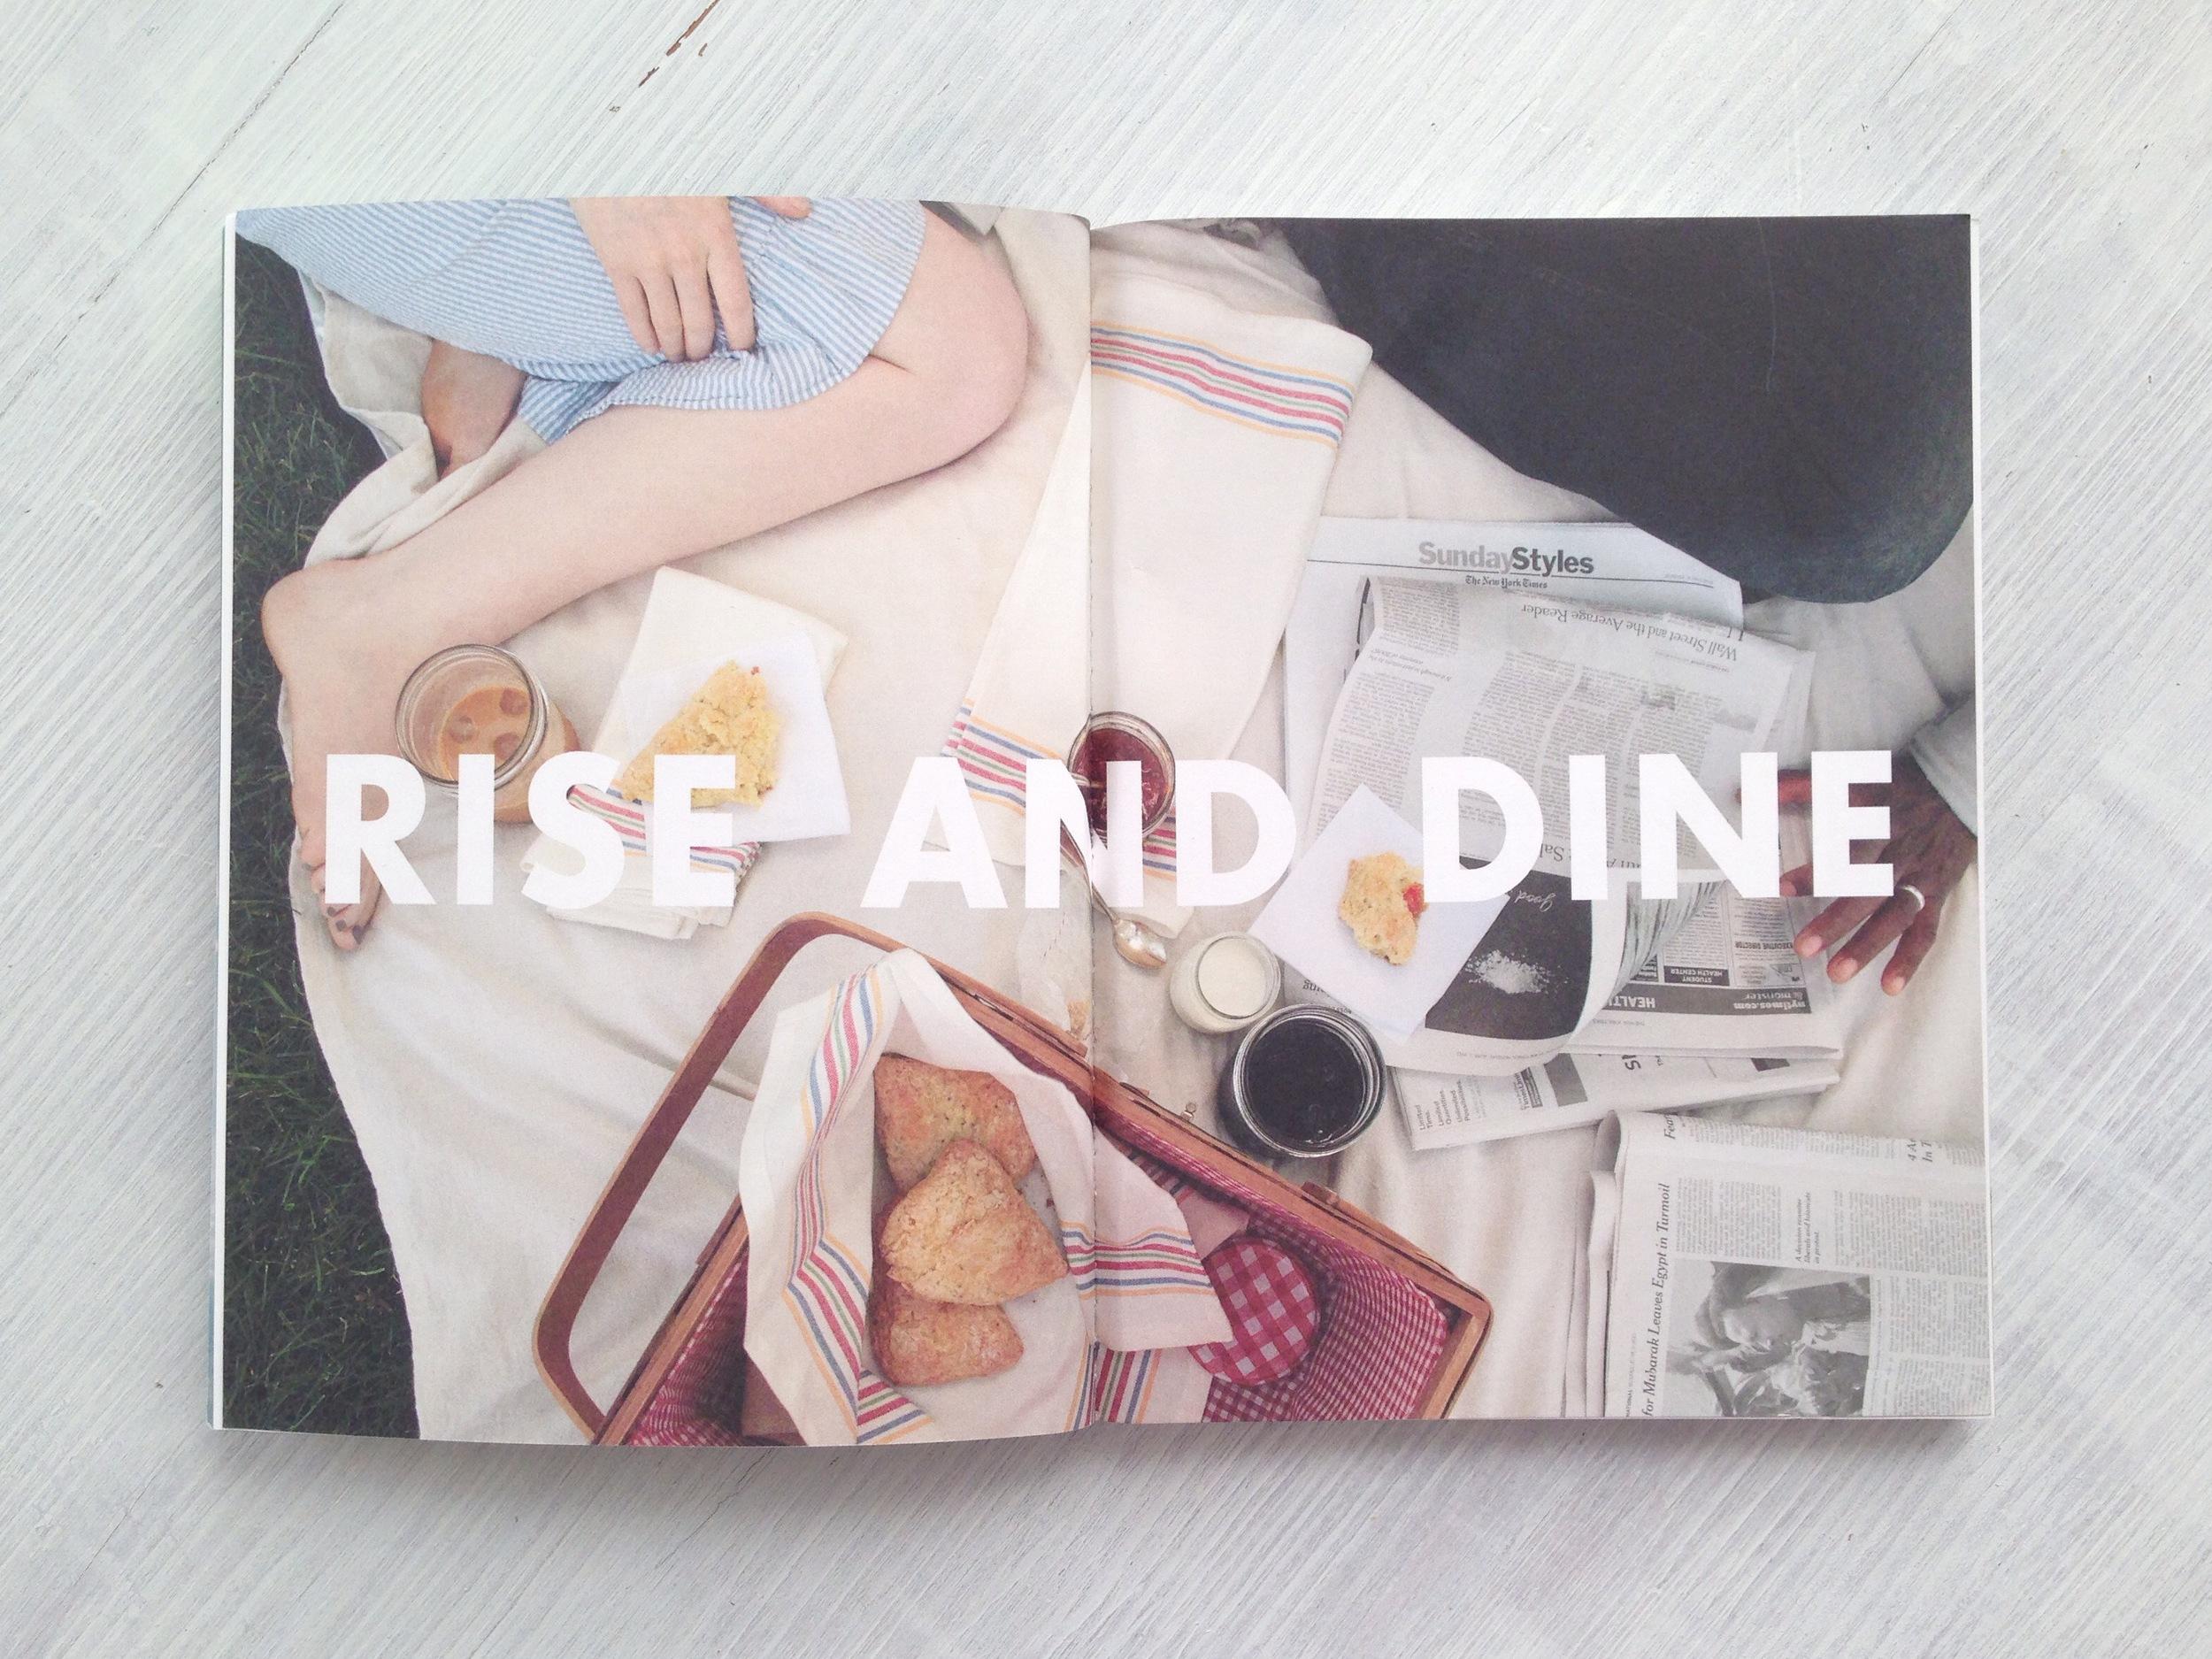 breakfast_picnic_scones.jpg